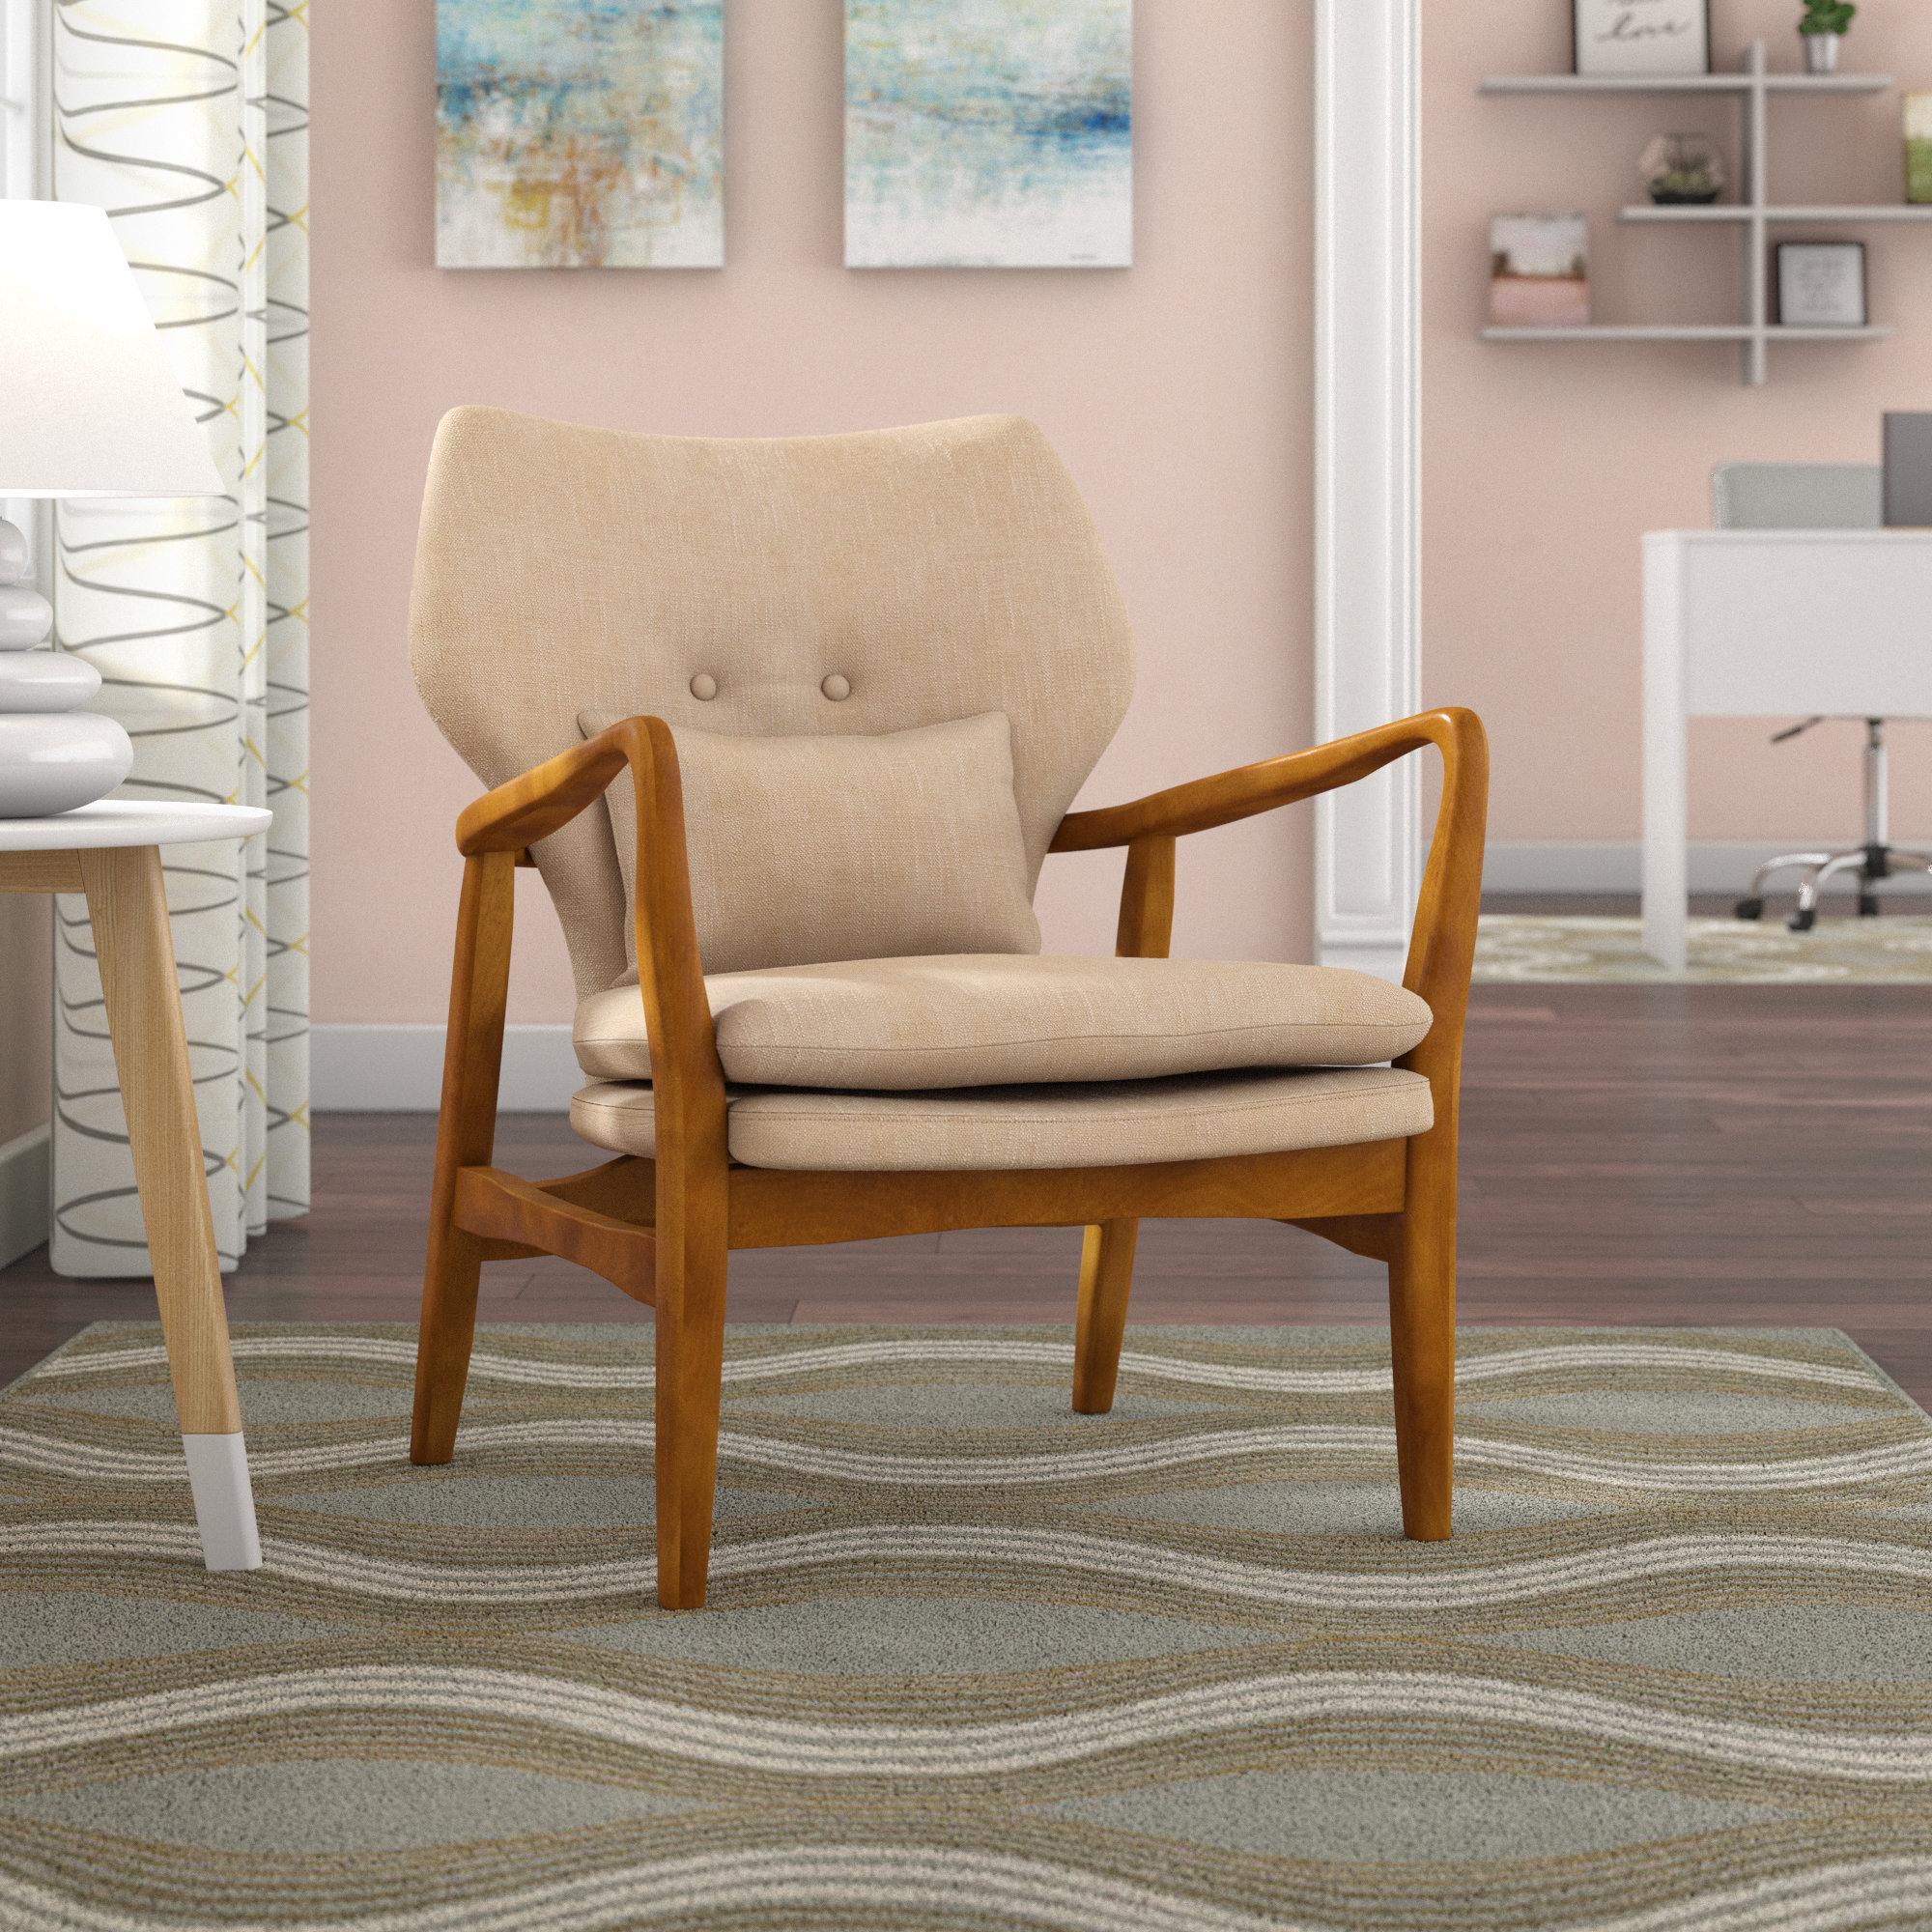 Zipcode Design Andersen Armchair & Reviews | Wayfair Intended For Katrina Beige Swivel Glider Chairs (Photo 13 of 25)